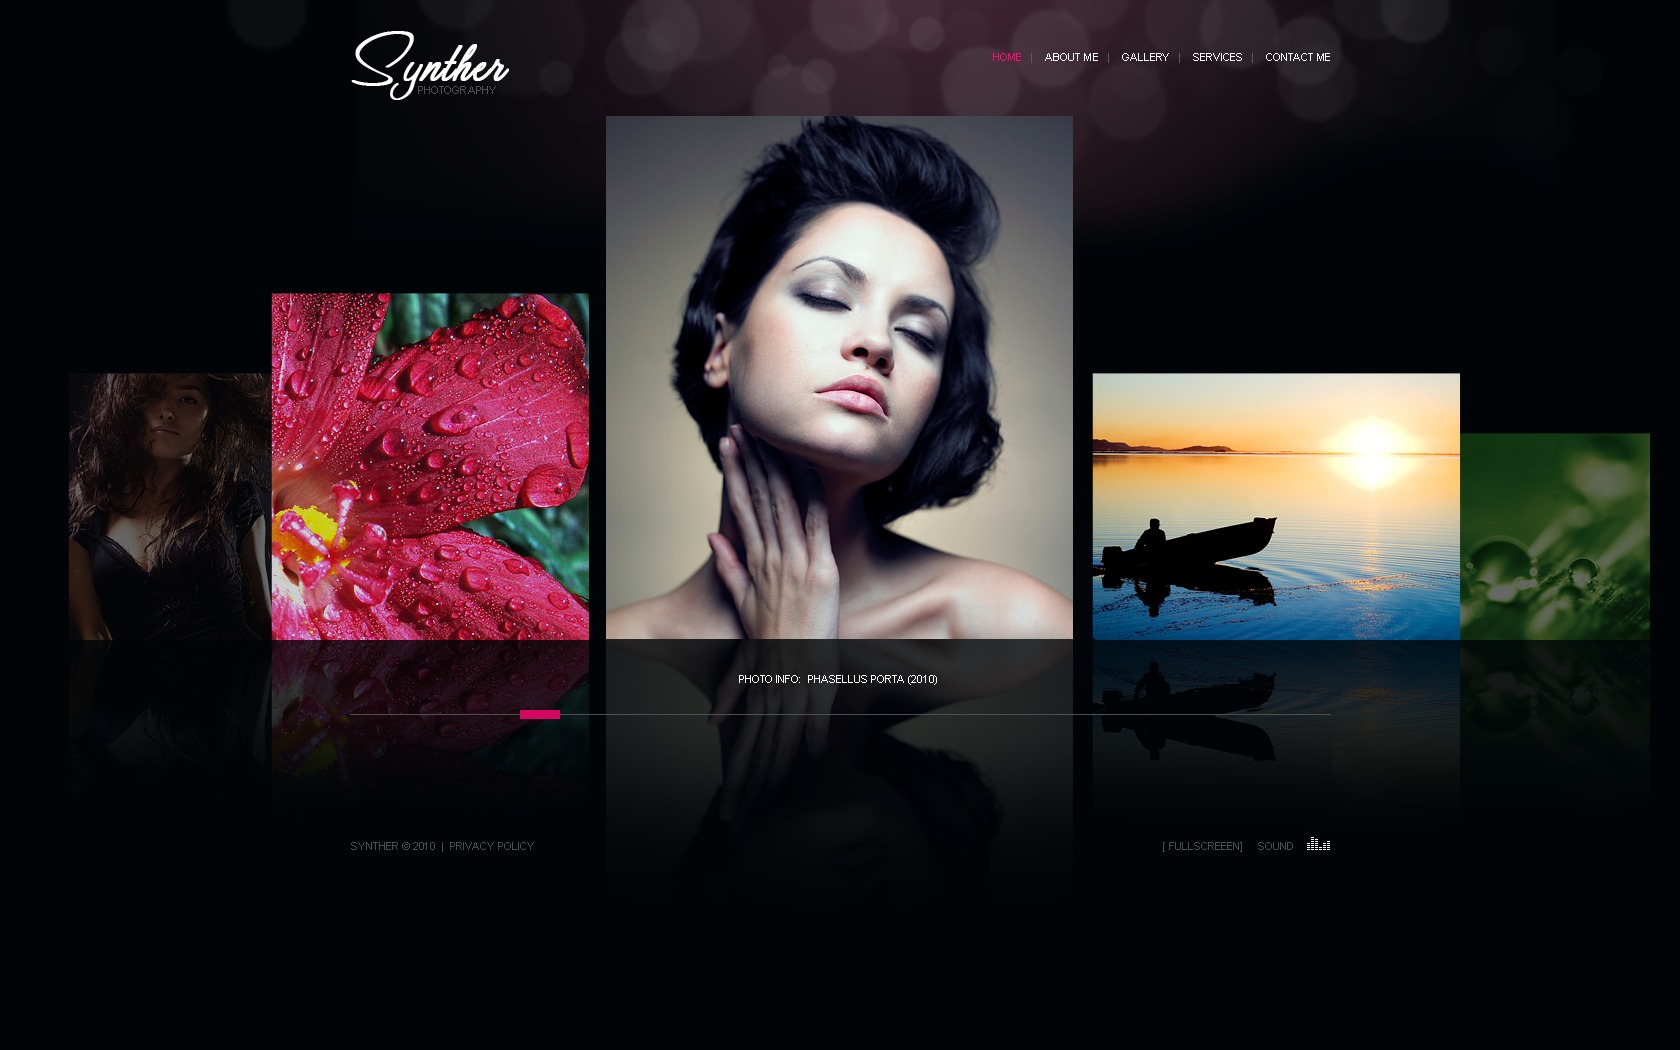 WEB DESIGN SERVICE, WEB DESIGN PORTFOLIO - CreatingOnline Flash photography portfolio template